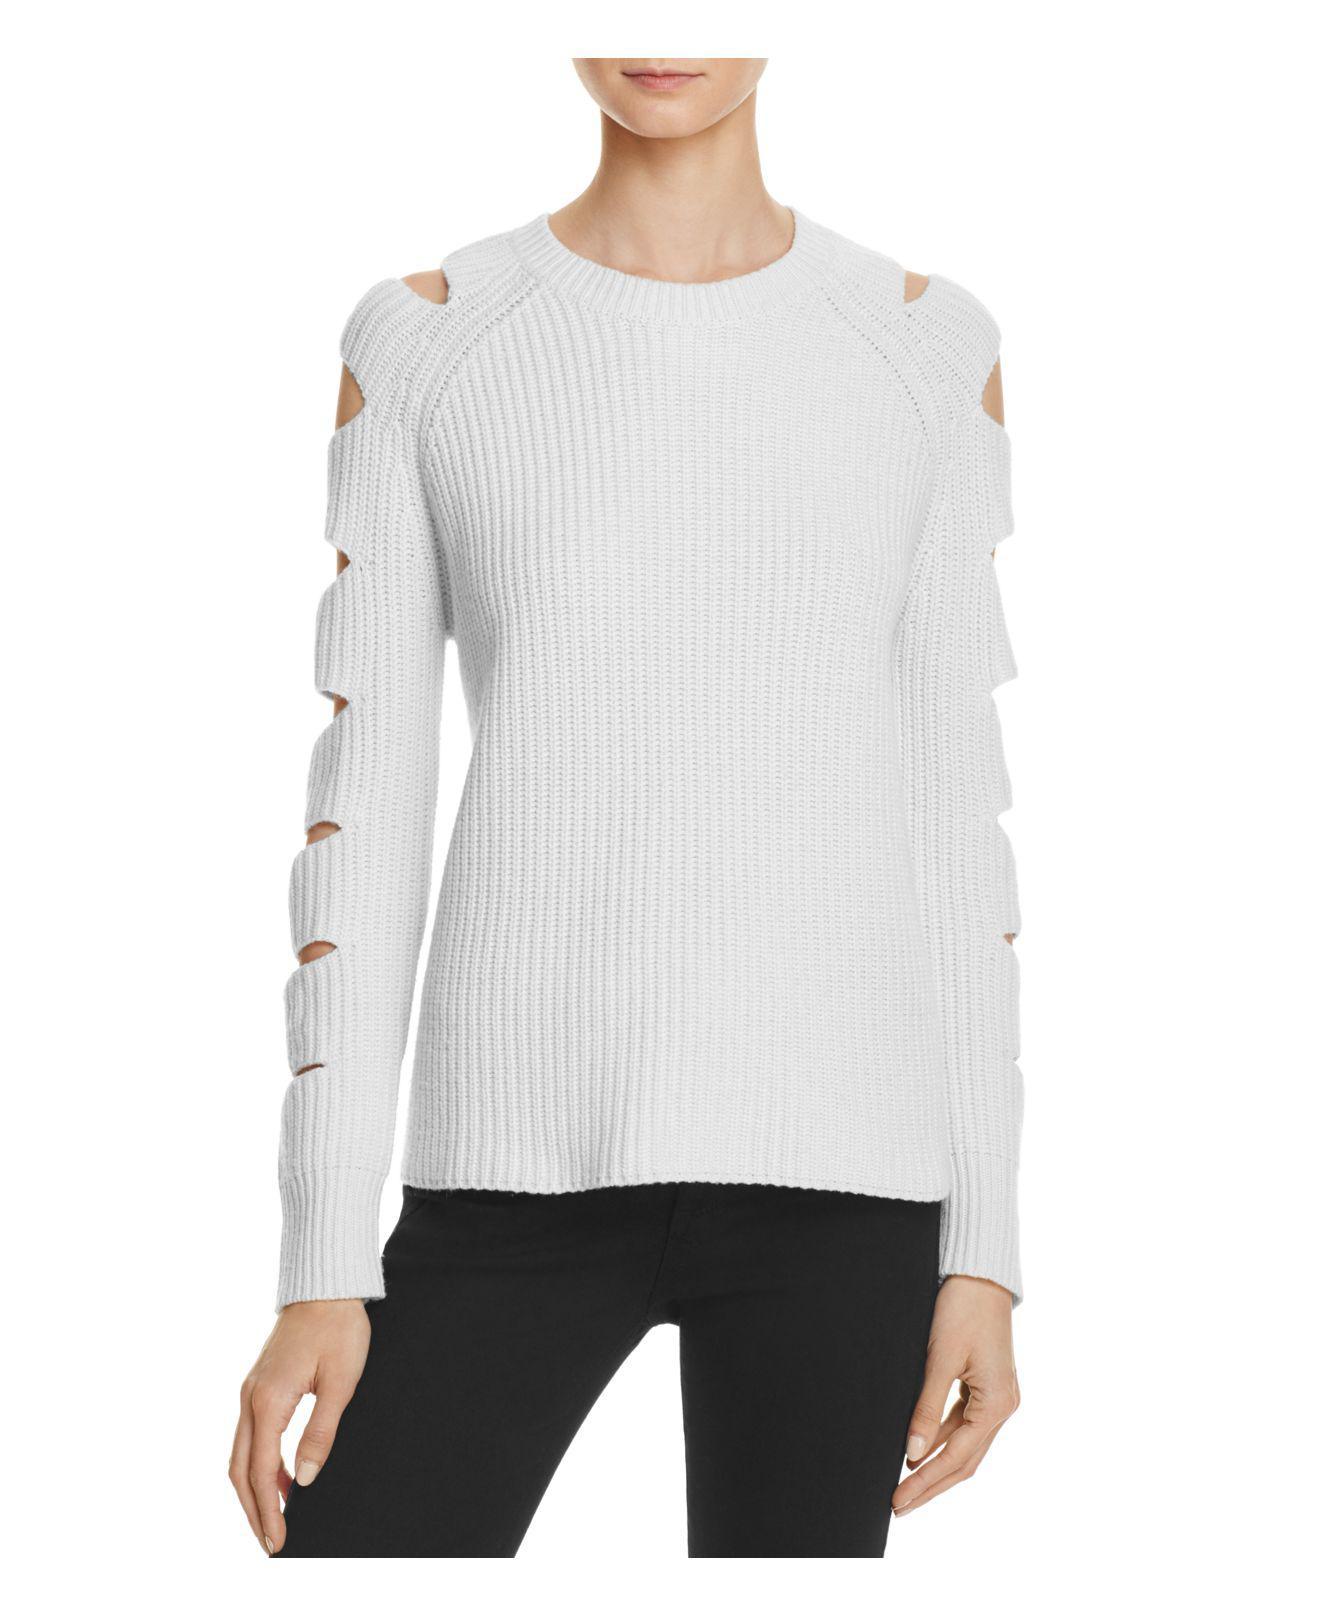 12faf4a5a0fa Zoe Jordan Locke Cutout Sleeve Sweater in White - Lyst